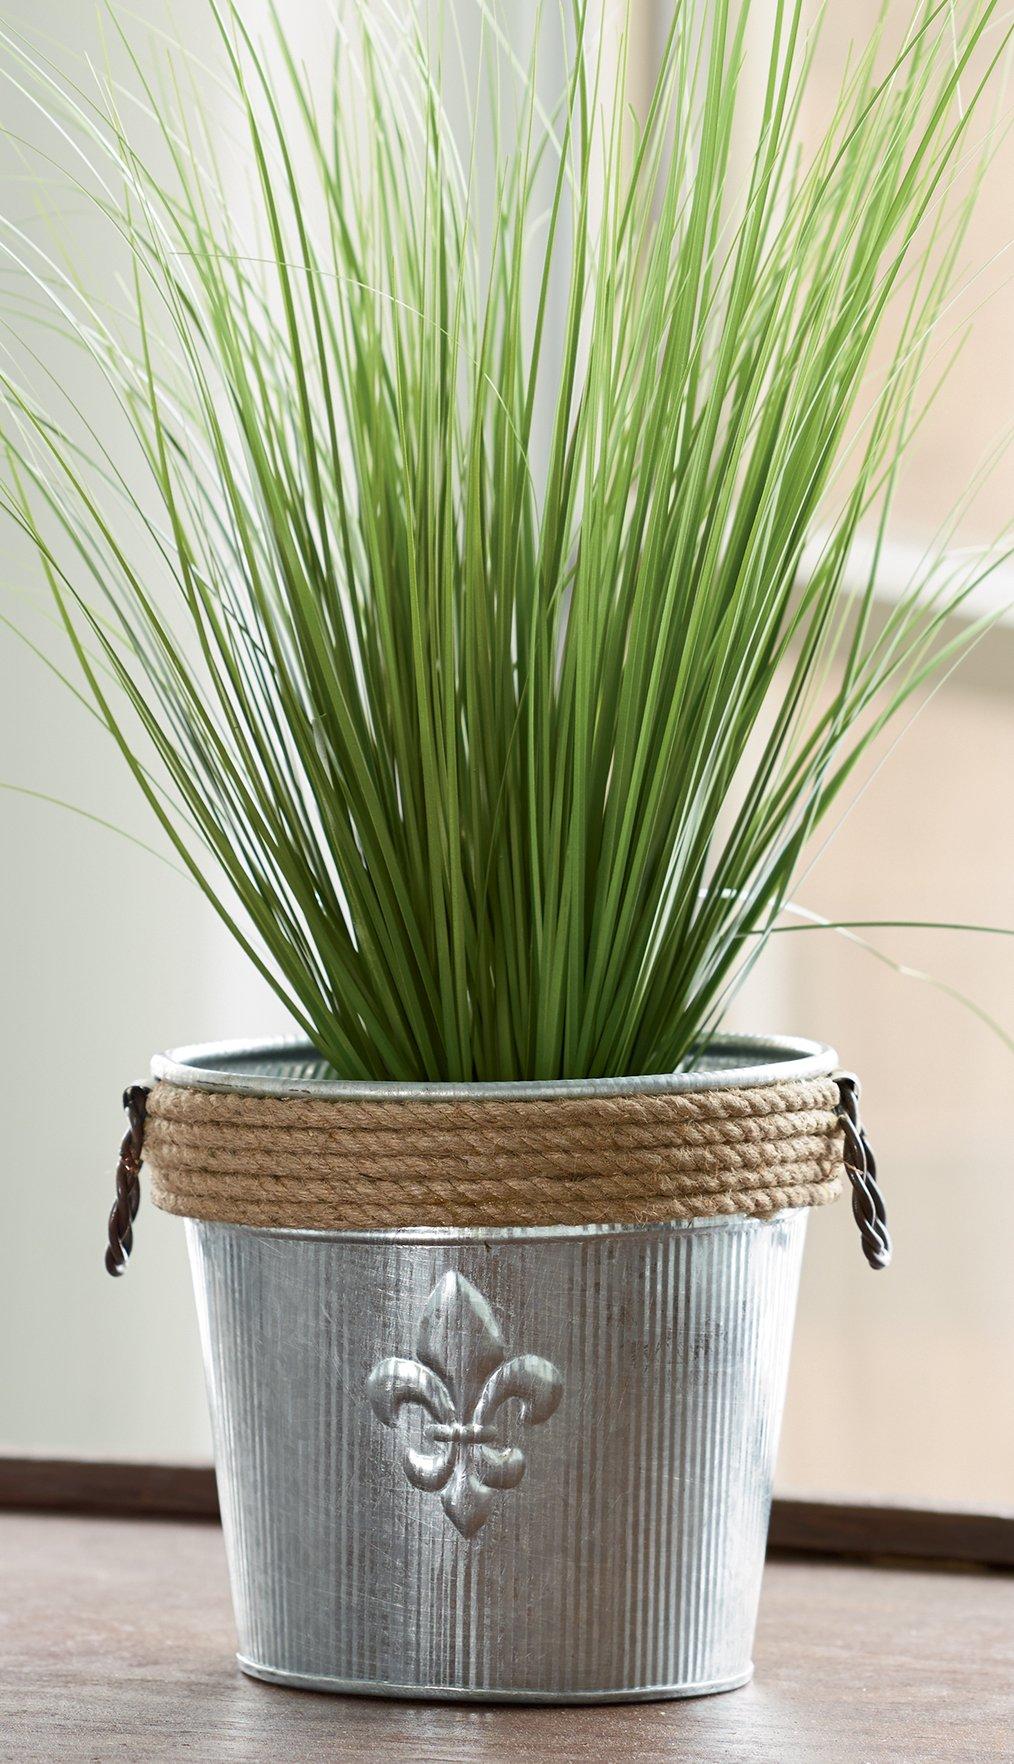 KINDWER Jute Rope Wrapped Galvanized Fleur De Lis Bucket